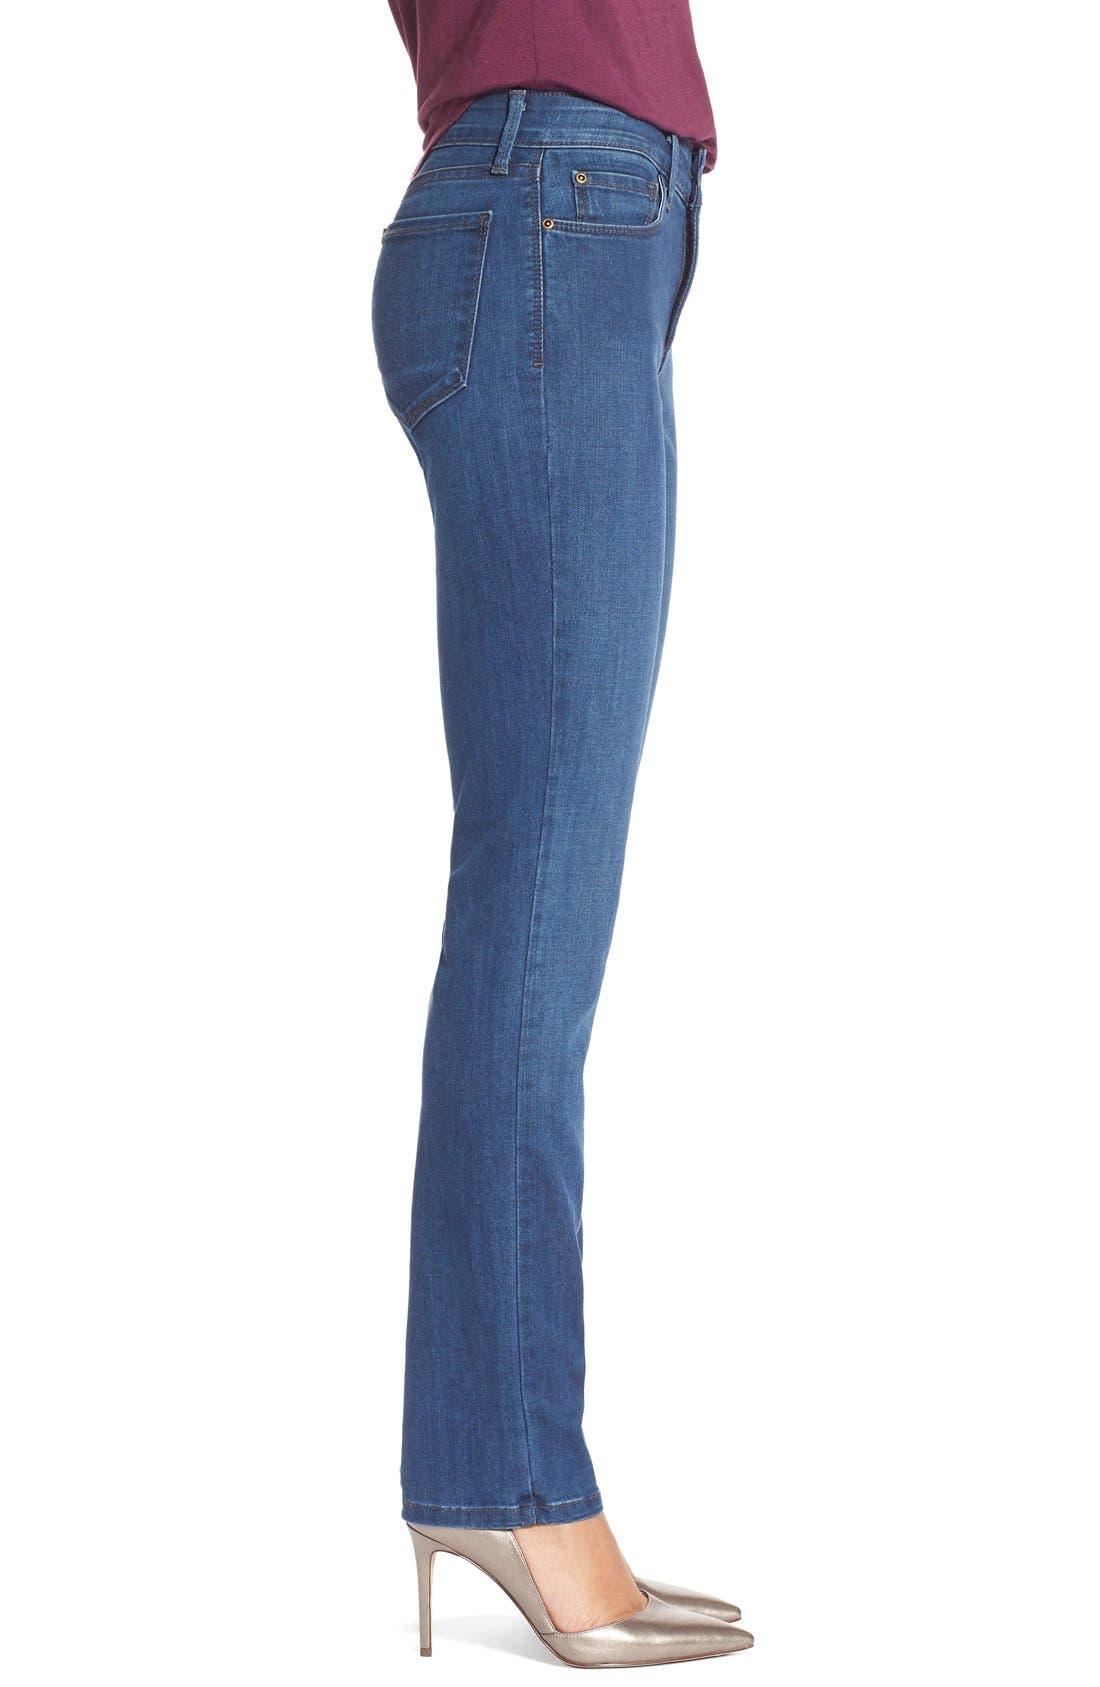 Alternate Image 3  - NYDJ'Sheri' Stretch Skinny Jeans (Valencia)(Petite)